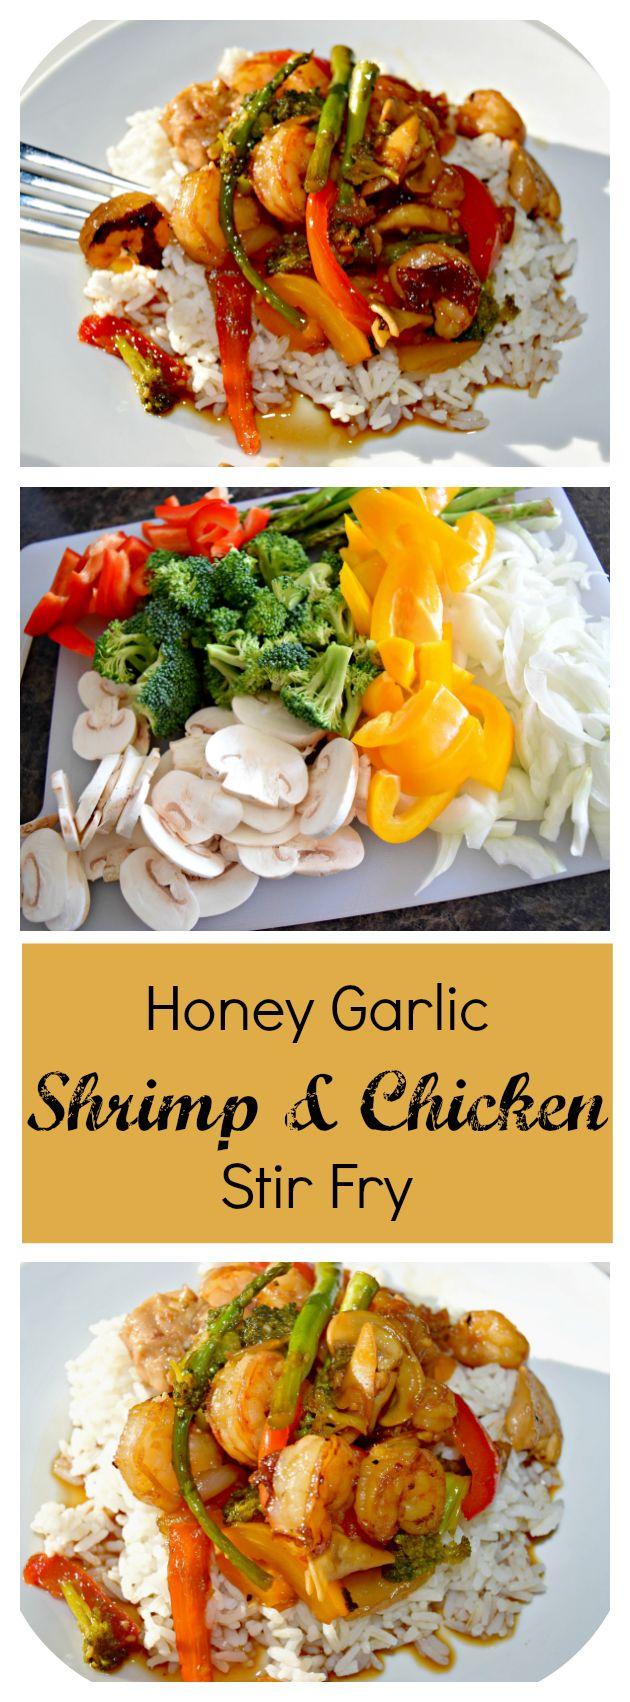 Honey Garlic Shrimp & Chicken Stir Fry